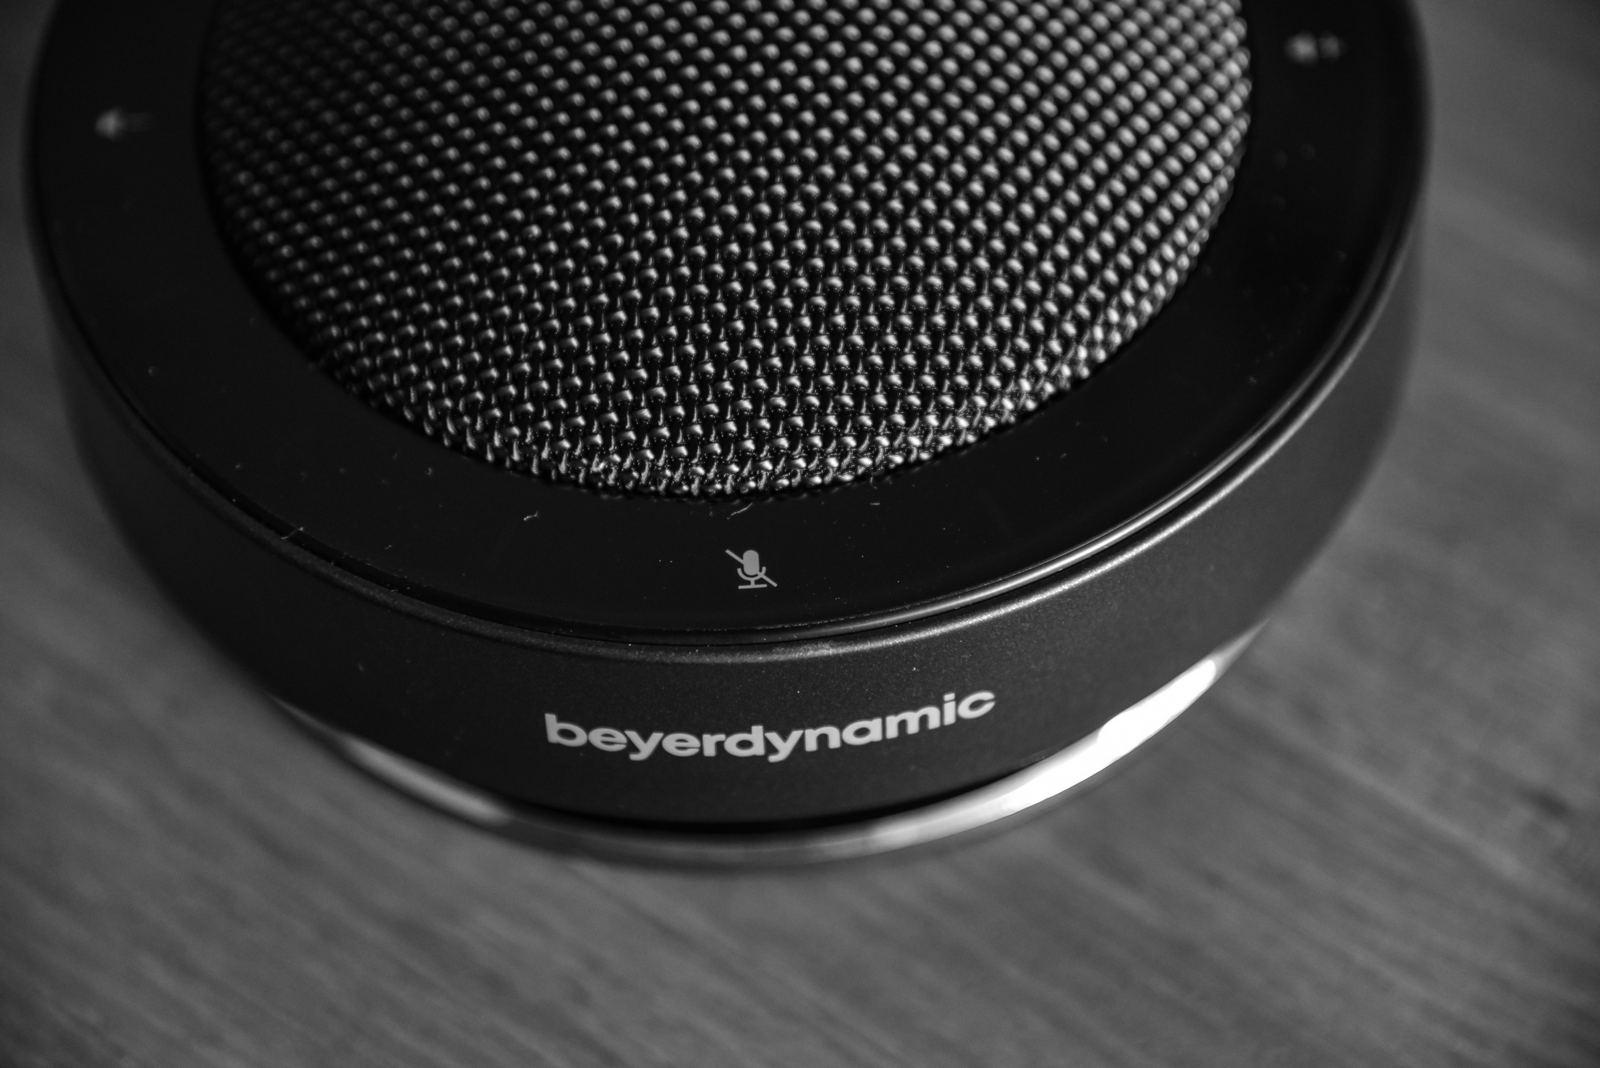 بررسی اسپیکرفون بلوتوث Phonum شرکت Beyerdynamic